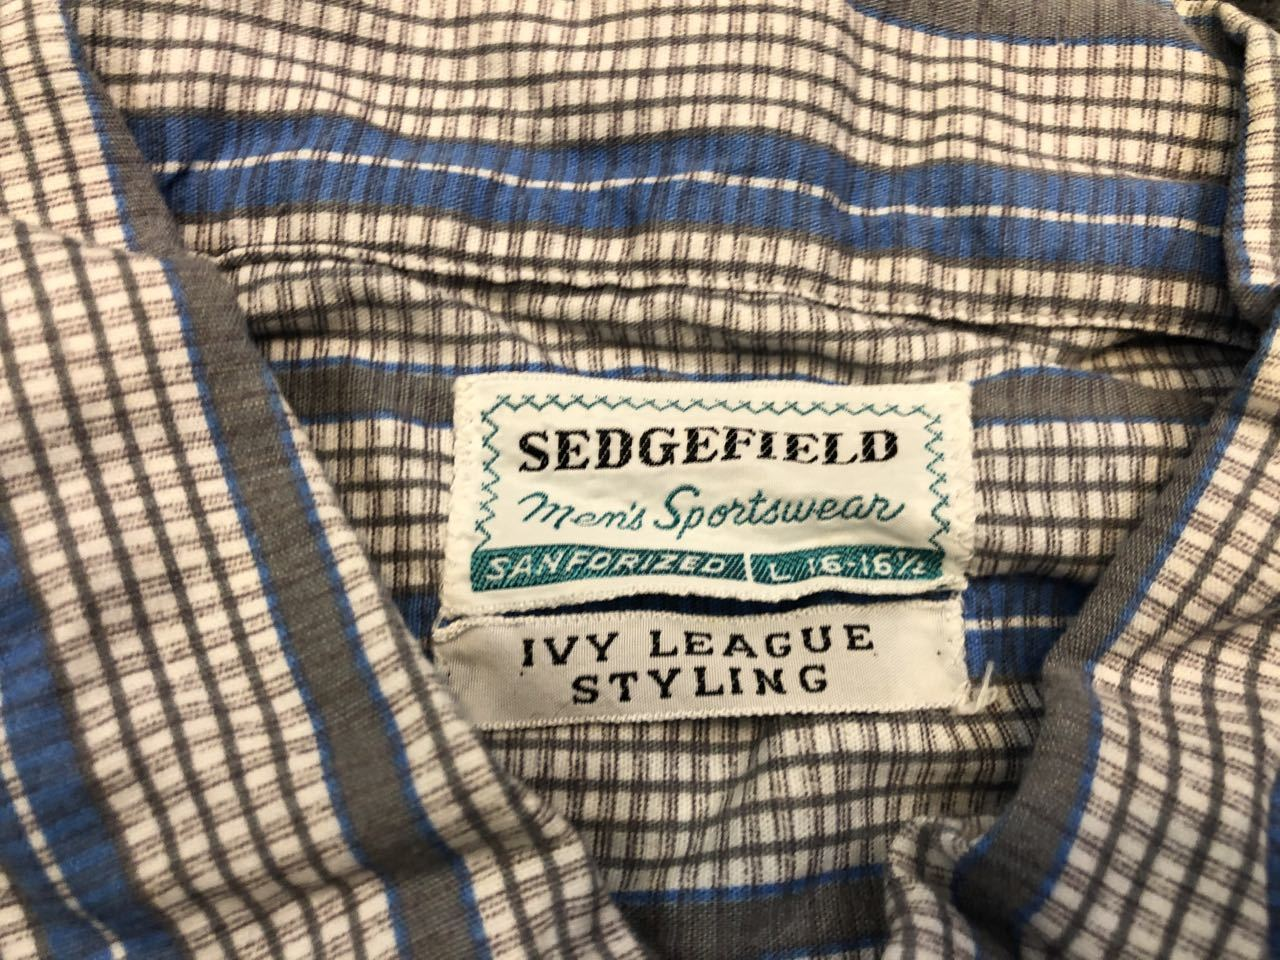 3月22日(日)入荷!60s SEDGEFIELD IVY LEAGUE STYLING B.D shirts!_c0144020_18155773.jpg